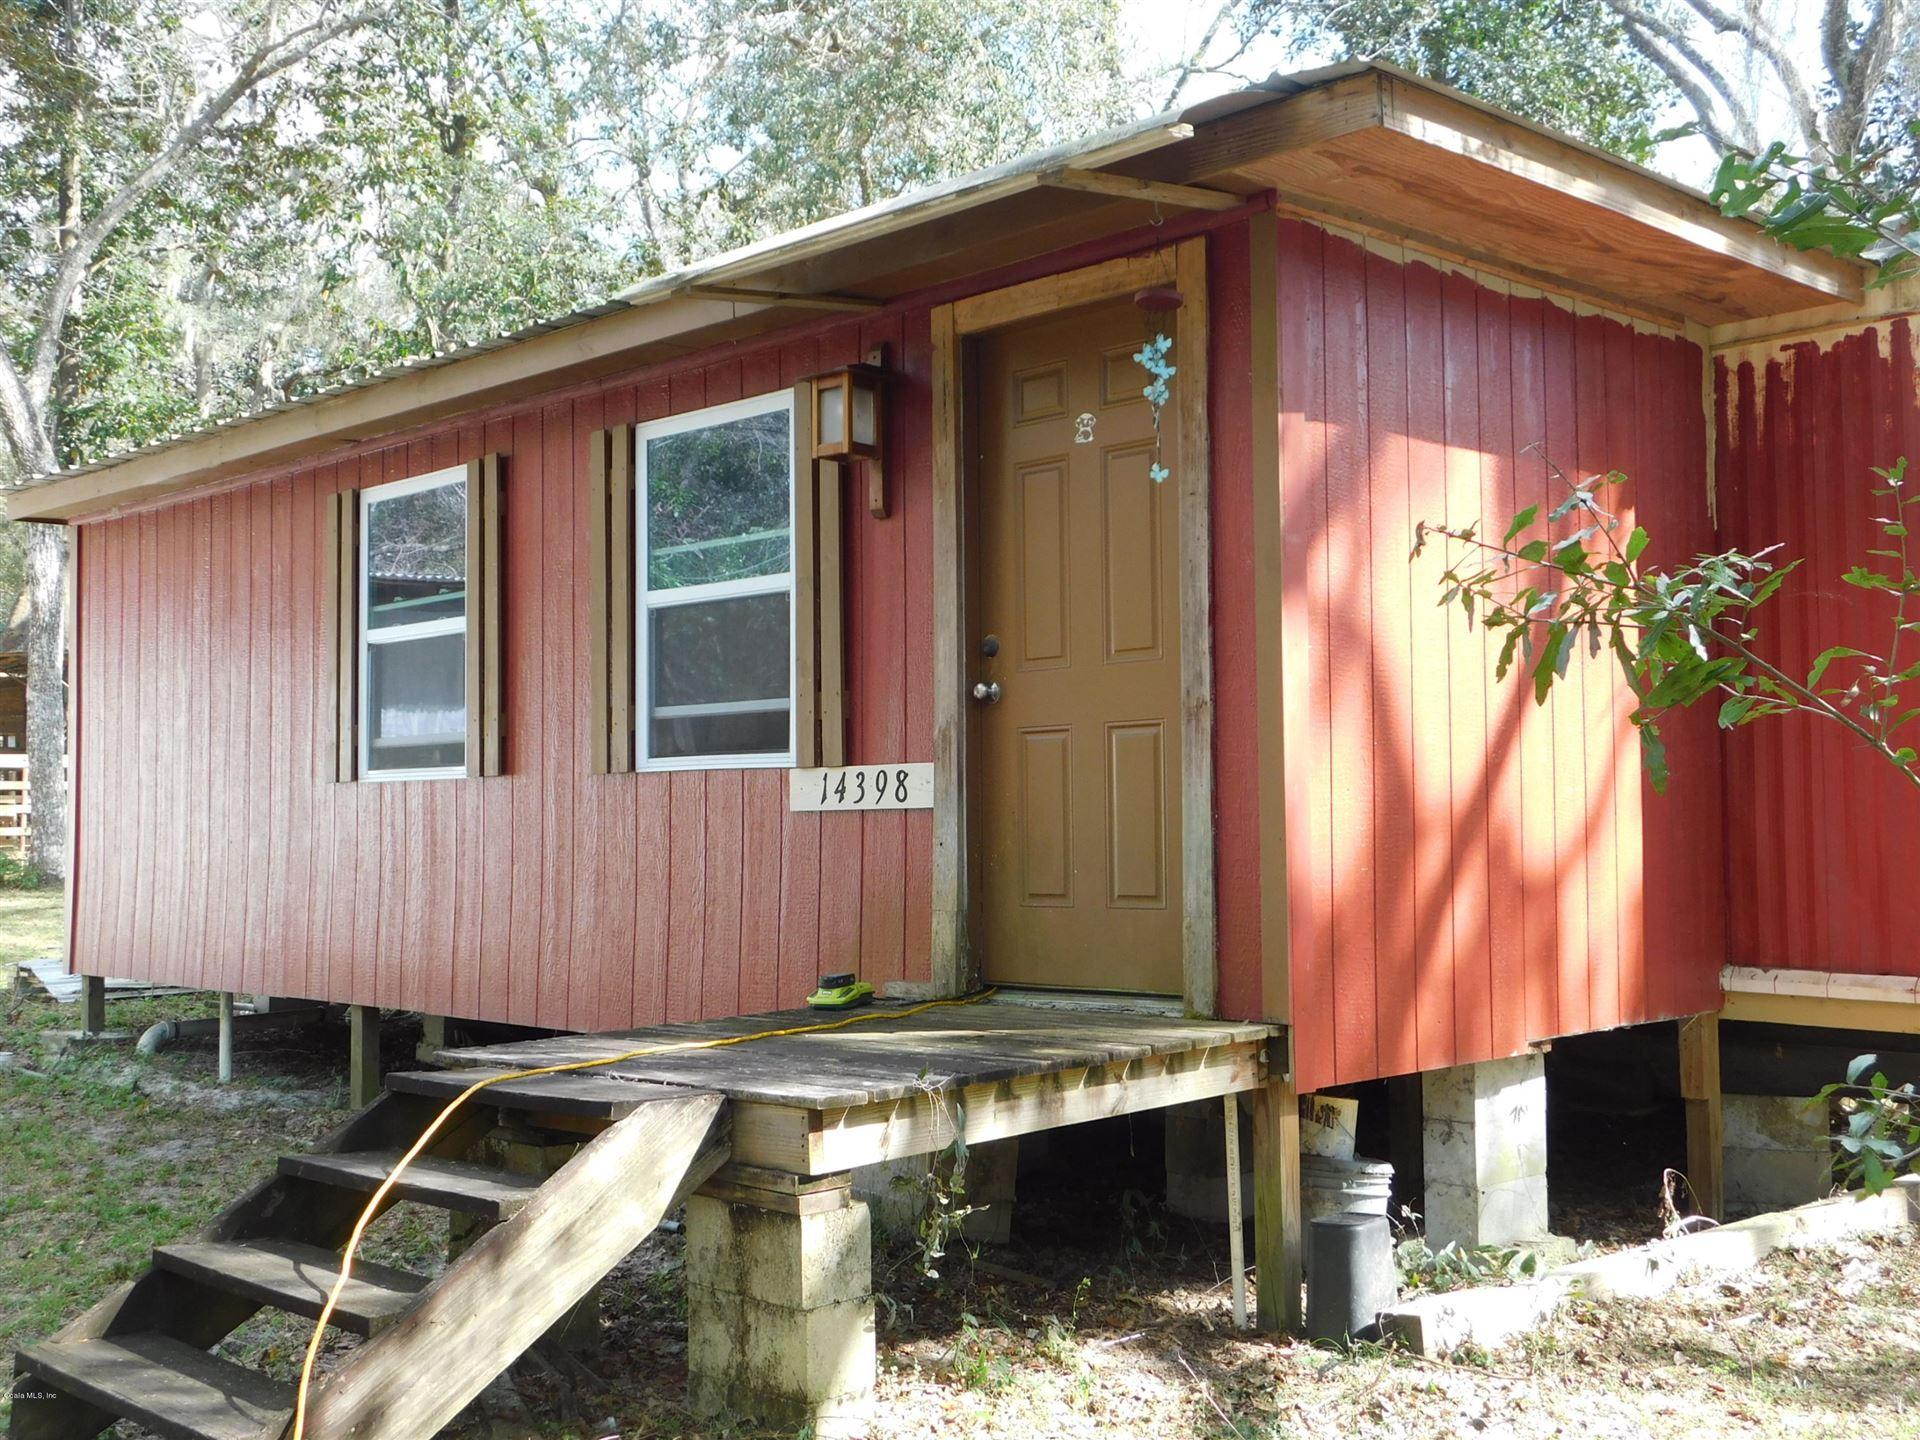 14398 NE 189th Place, Fort McCoy, FL 32134 - MLS#: 567145